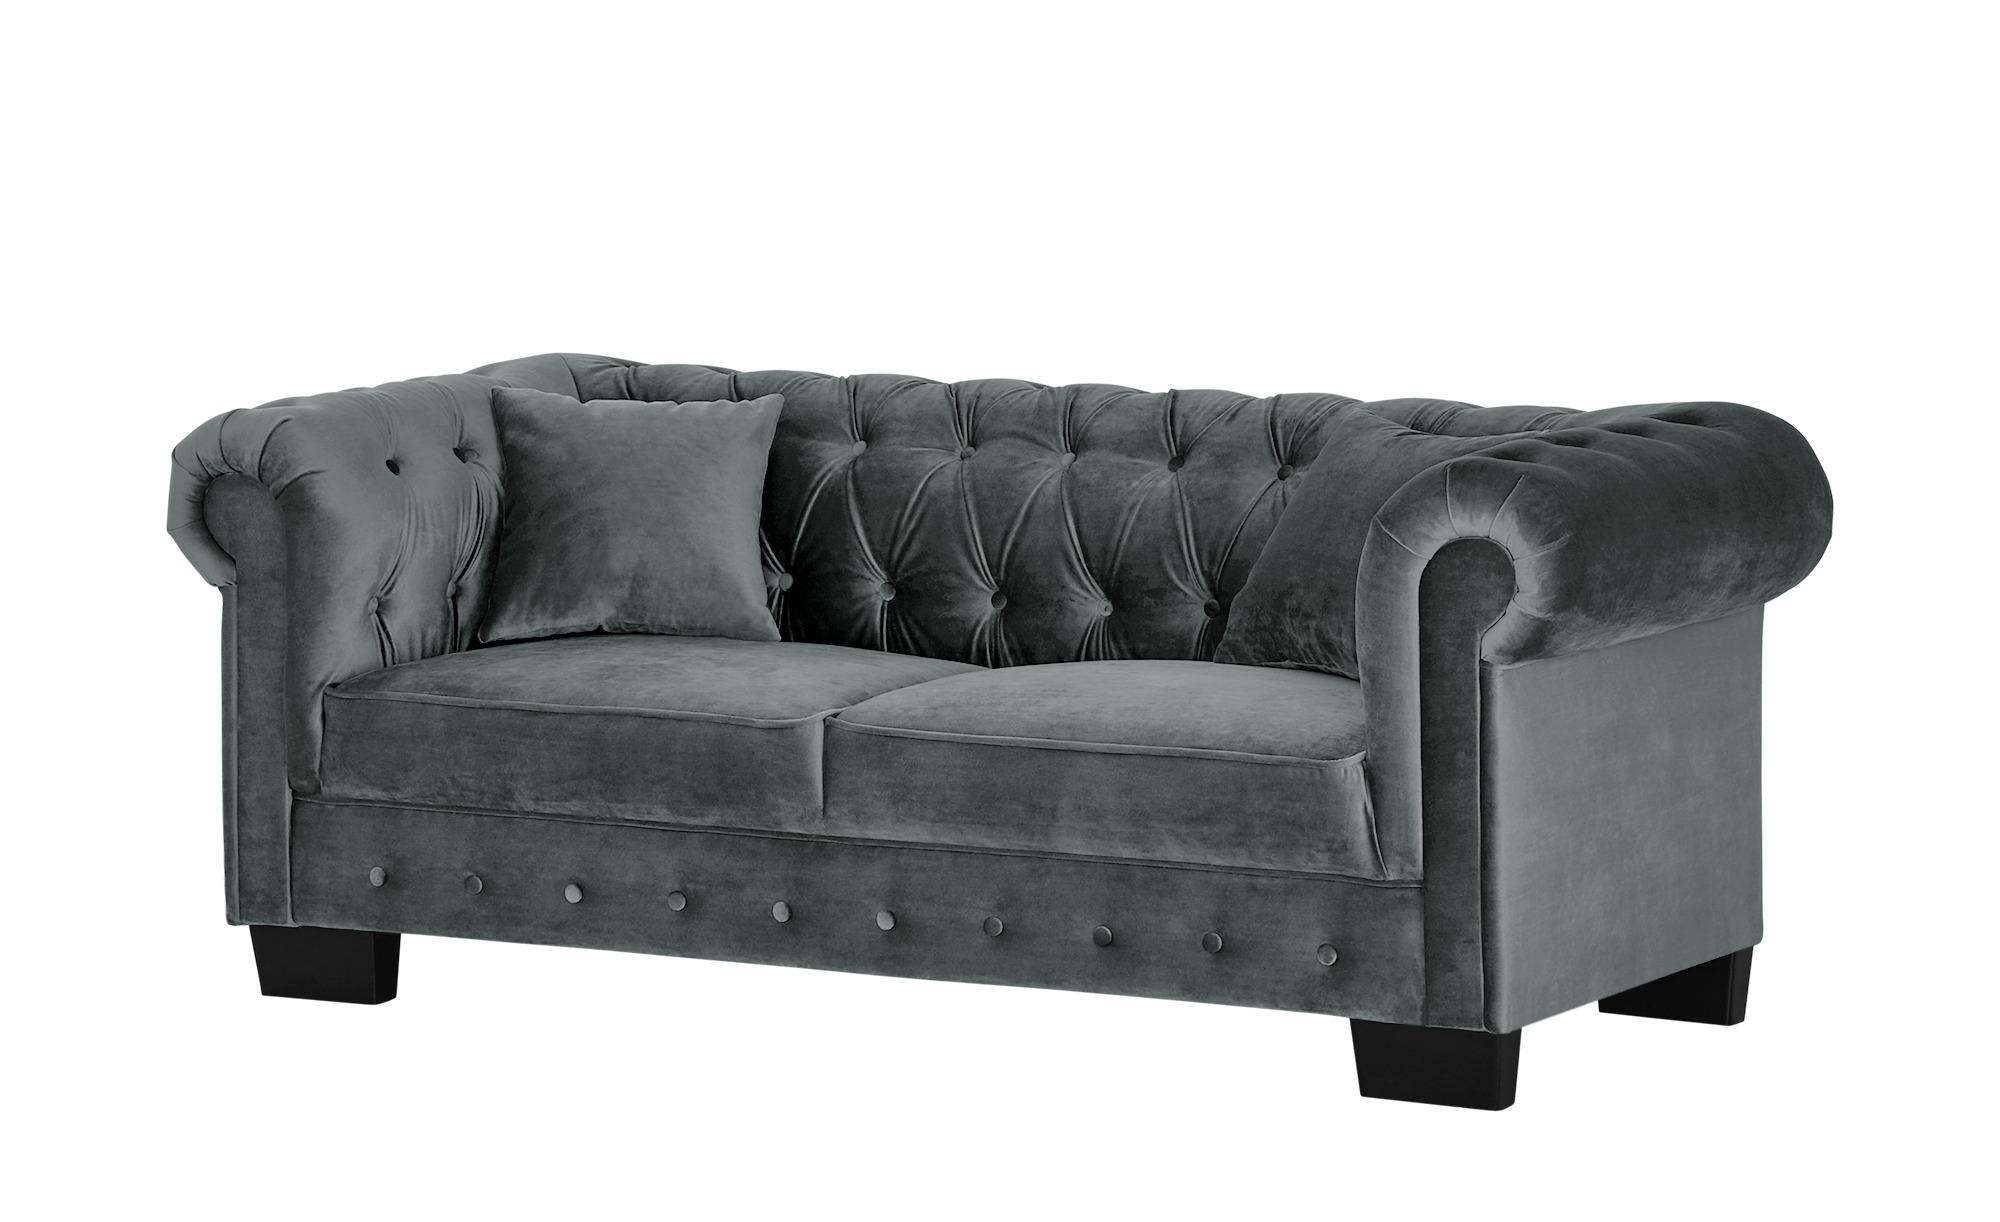 smart Sofa grau - Velour Chelli ¦ grau ¦ Maße (cm): B: 206 H: 77 T: 96 Polstermöbel > Sofas > 3-Sitzer - Höffner